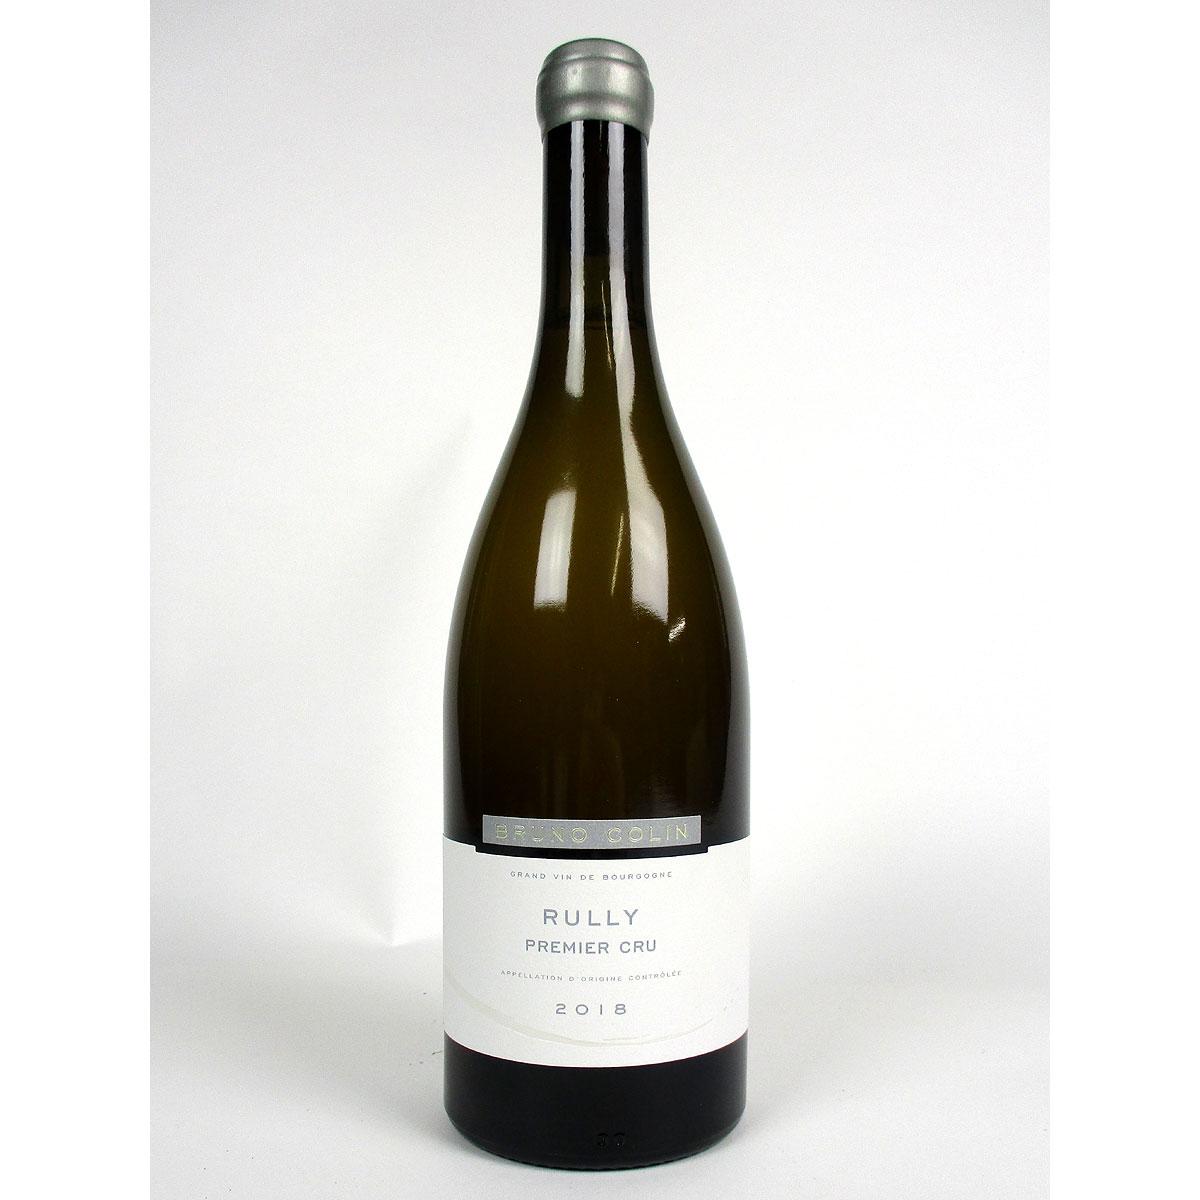 Rully: Domaine Colin 'Premier Cru' Blanc 2018 - Bottle